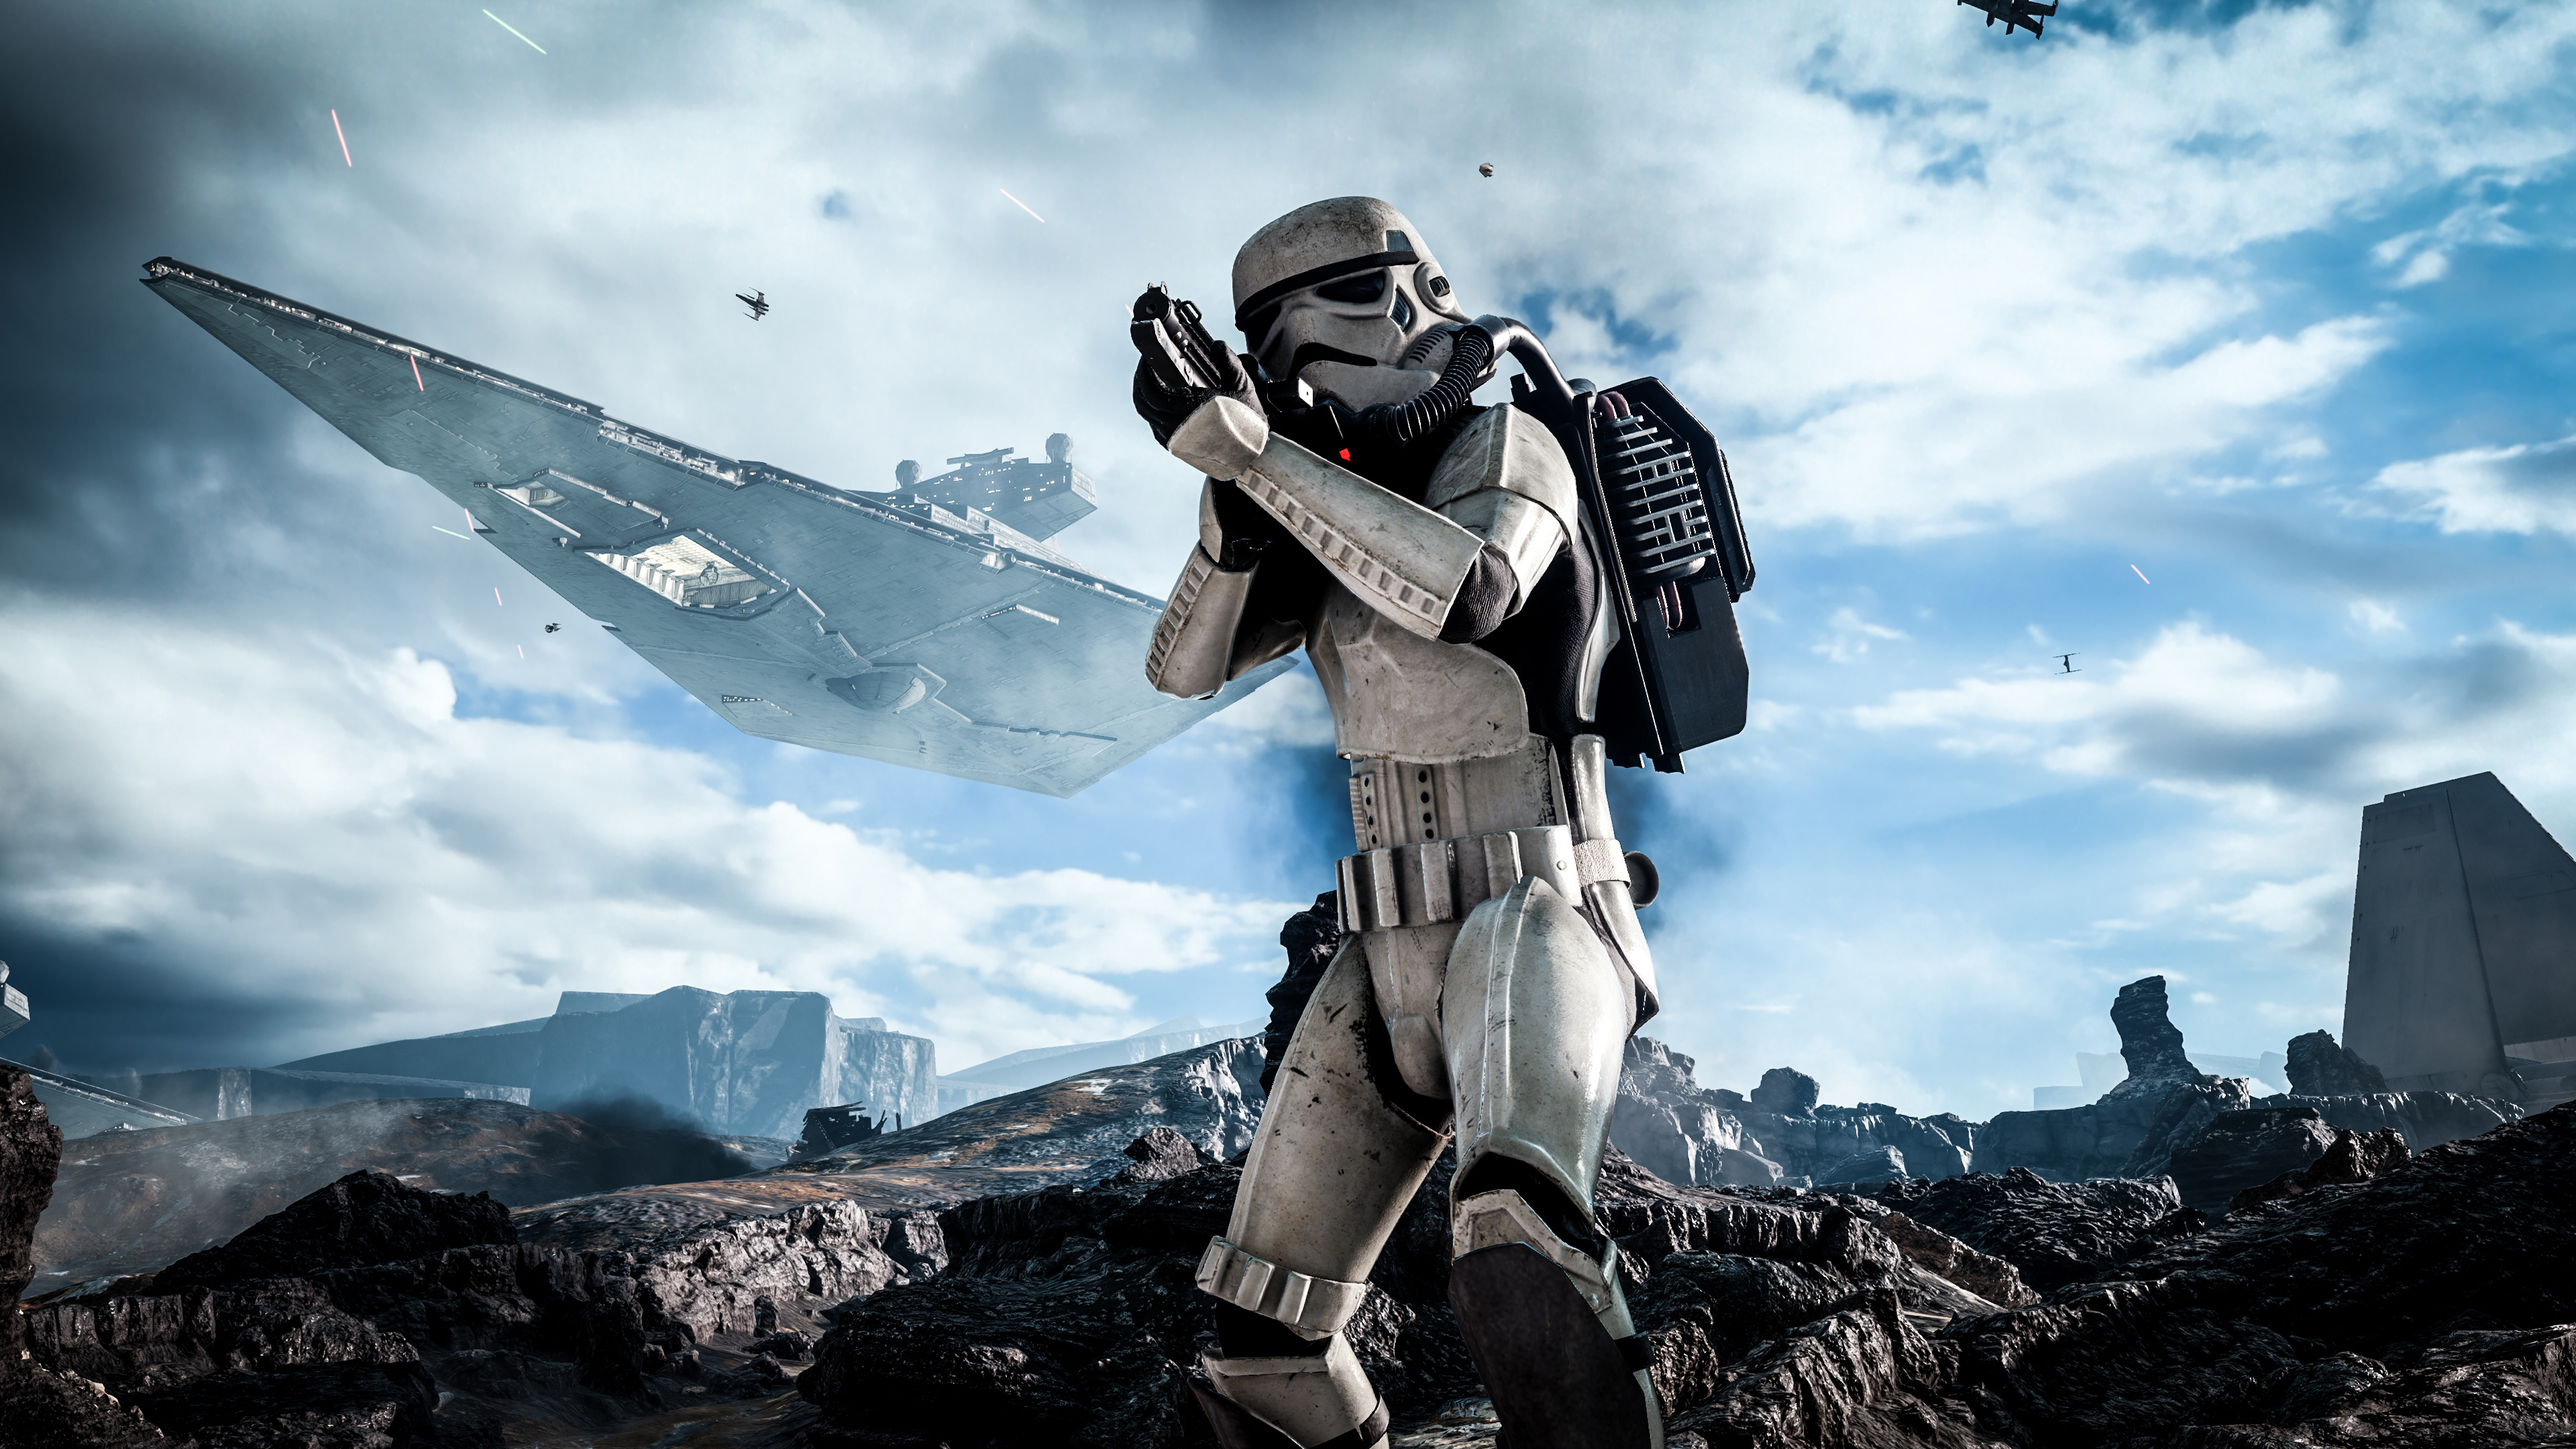 Star Wars Battlefront Stormtrooper Wallpapers HD Wallpapers 3840x2160